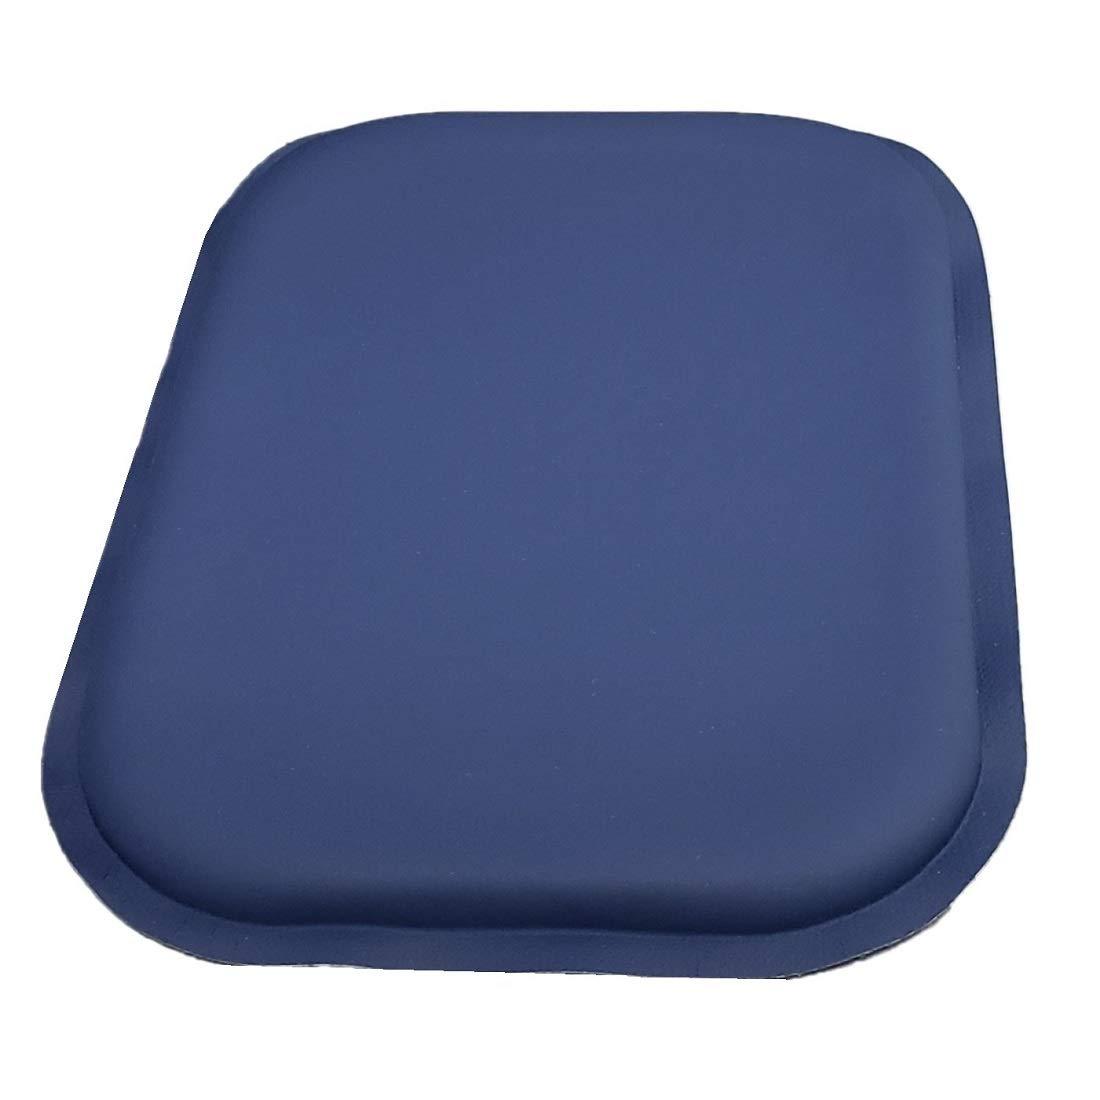 ULTRAGEL ''Gaming Super Comfy Arm/Elbow/Wrist Rest Gel Pad (Mouse Wrist Pad 5.5x7.5, Blue)